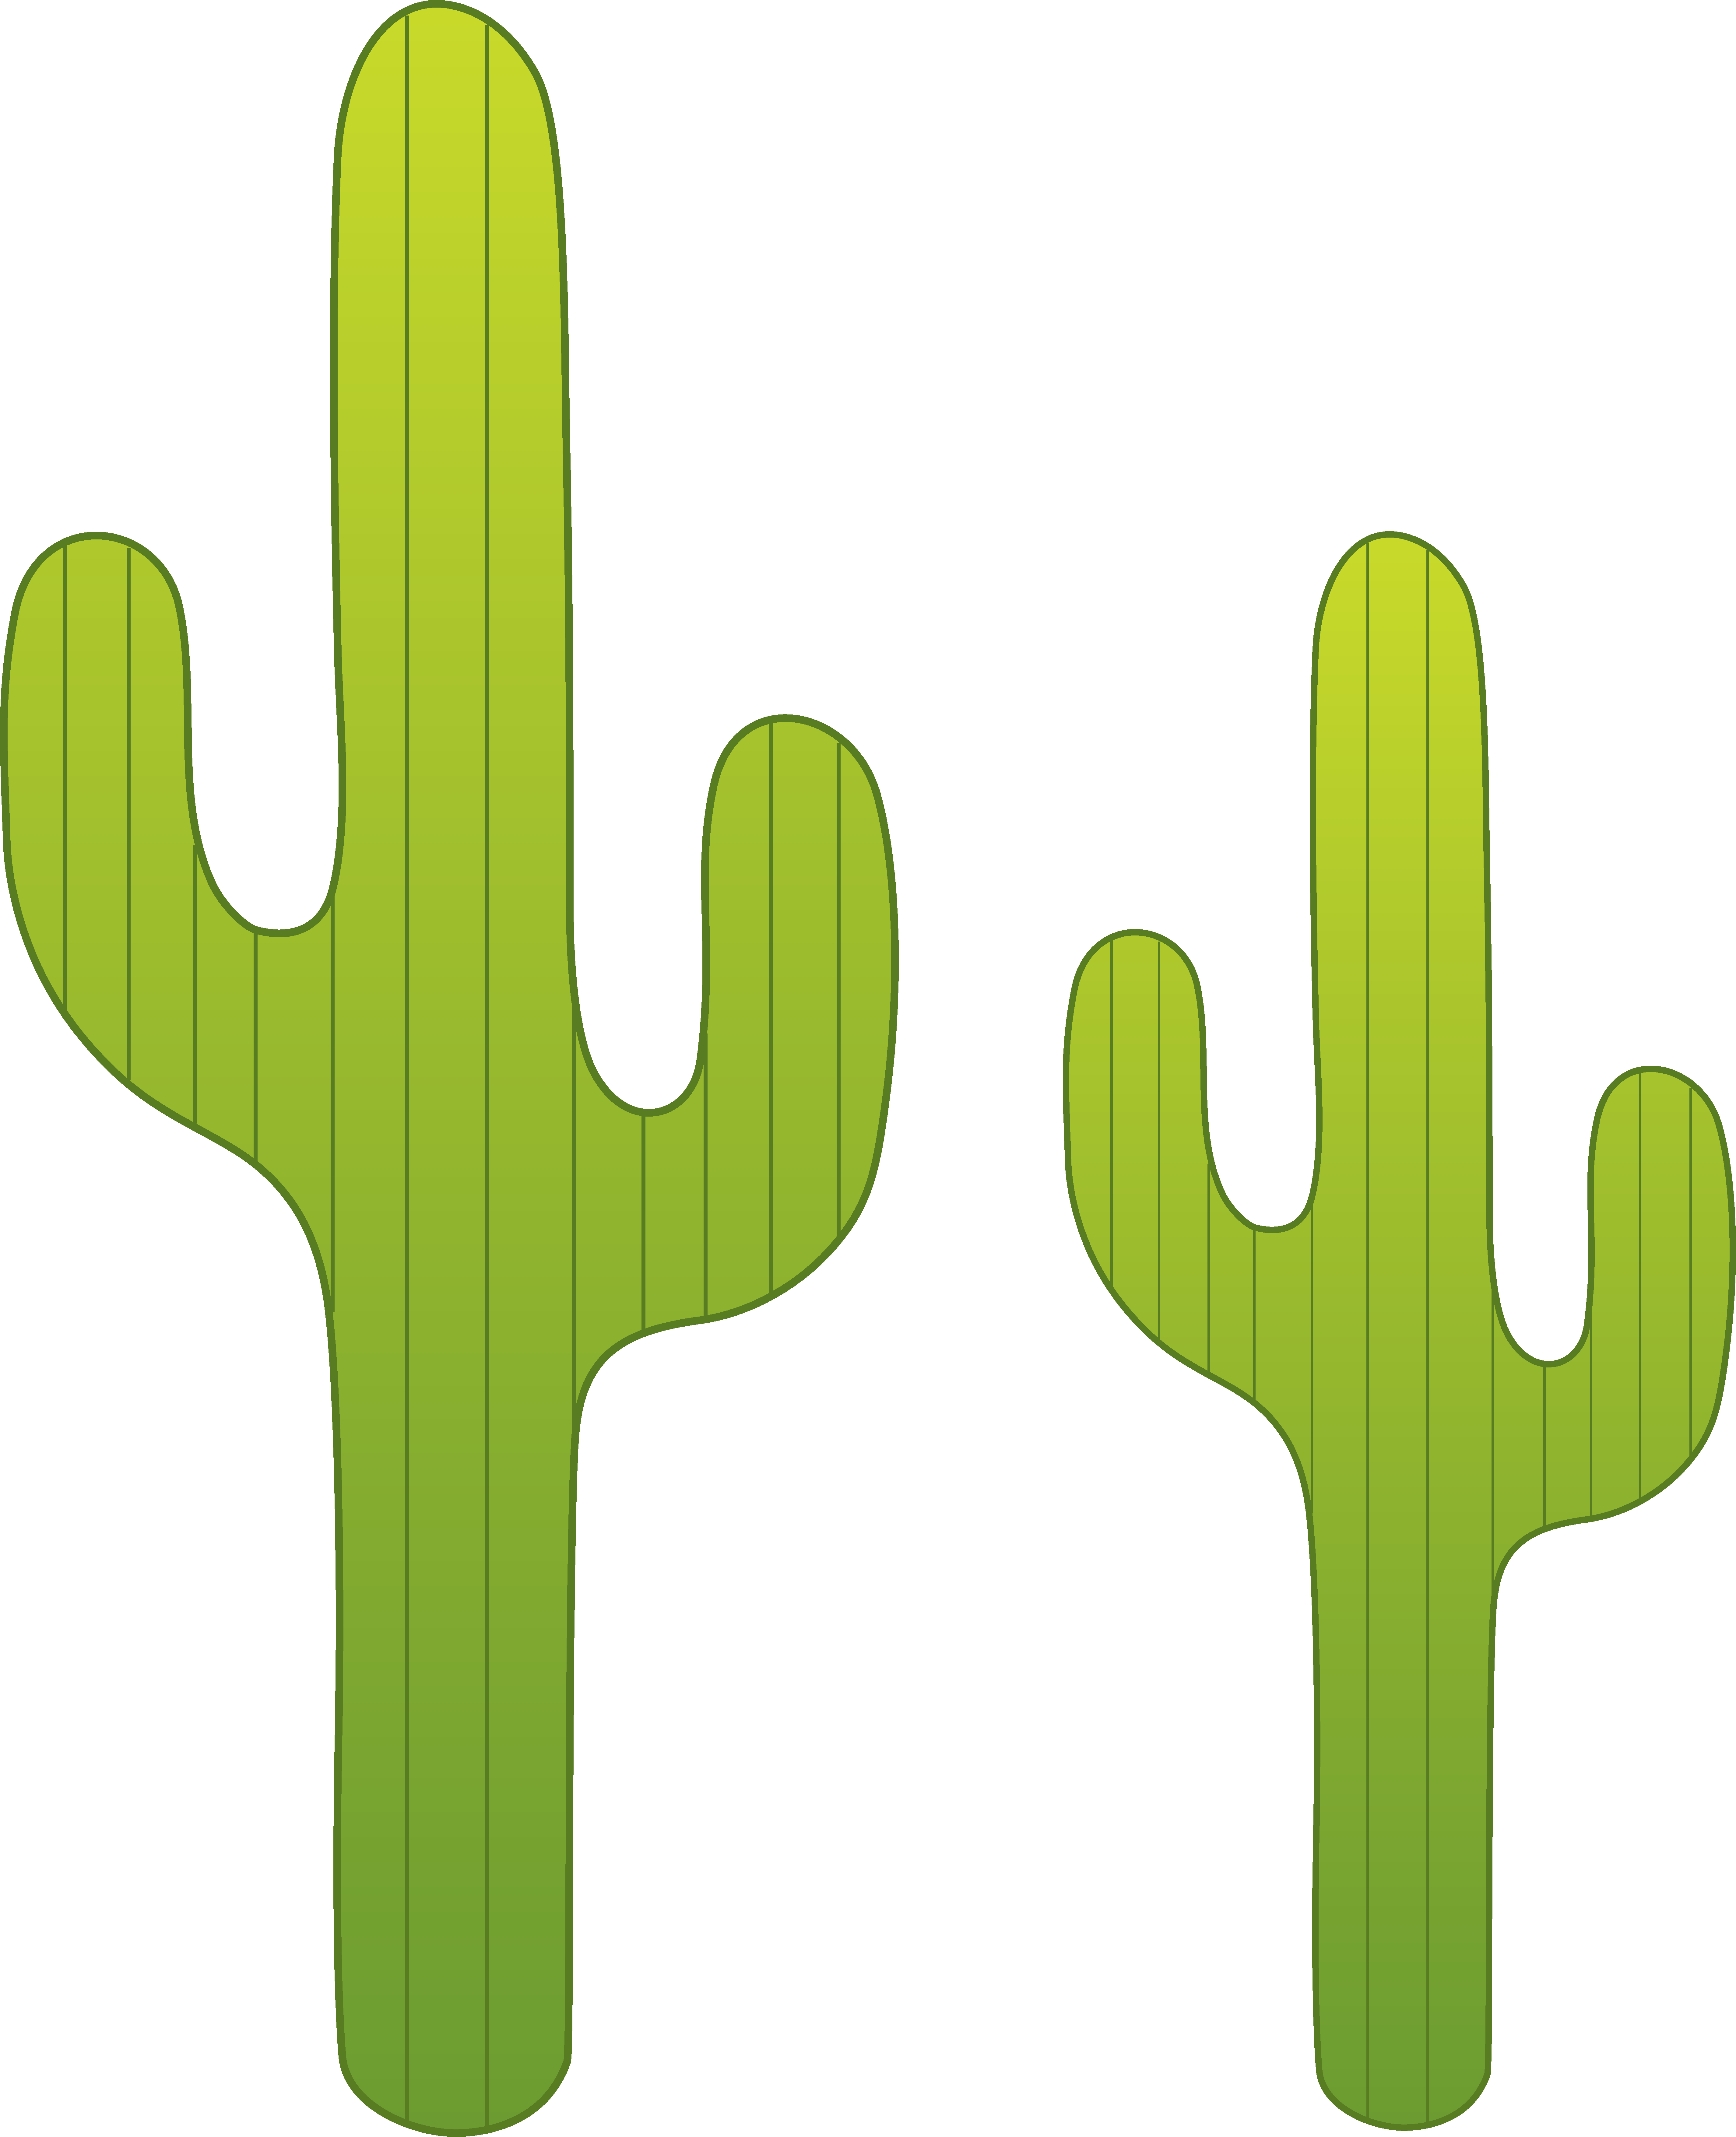 Top Cactus Clipart Images-Top cactus clipart images-18